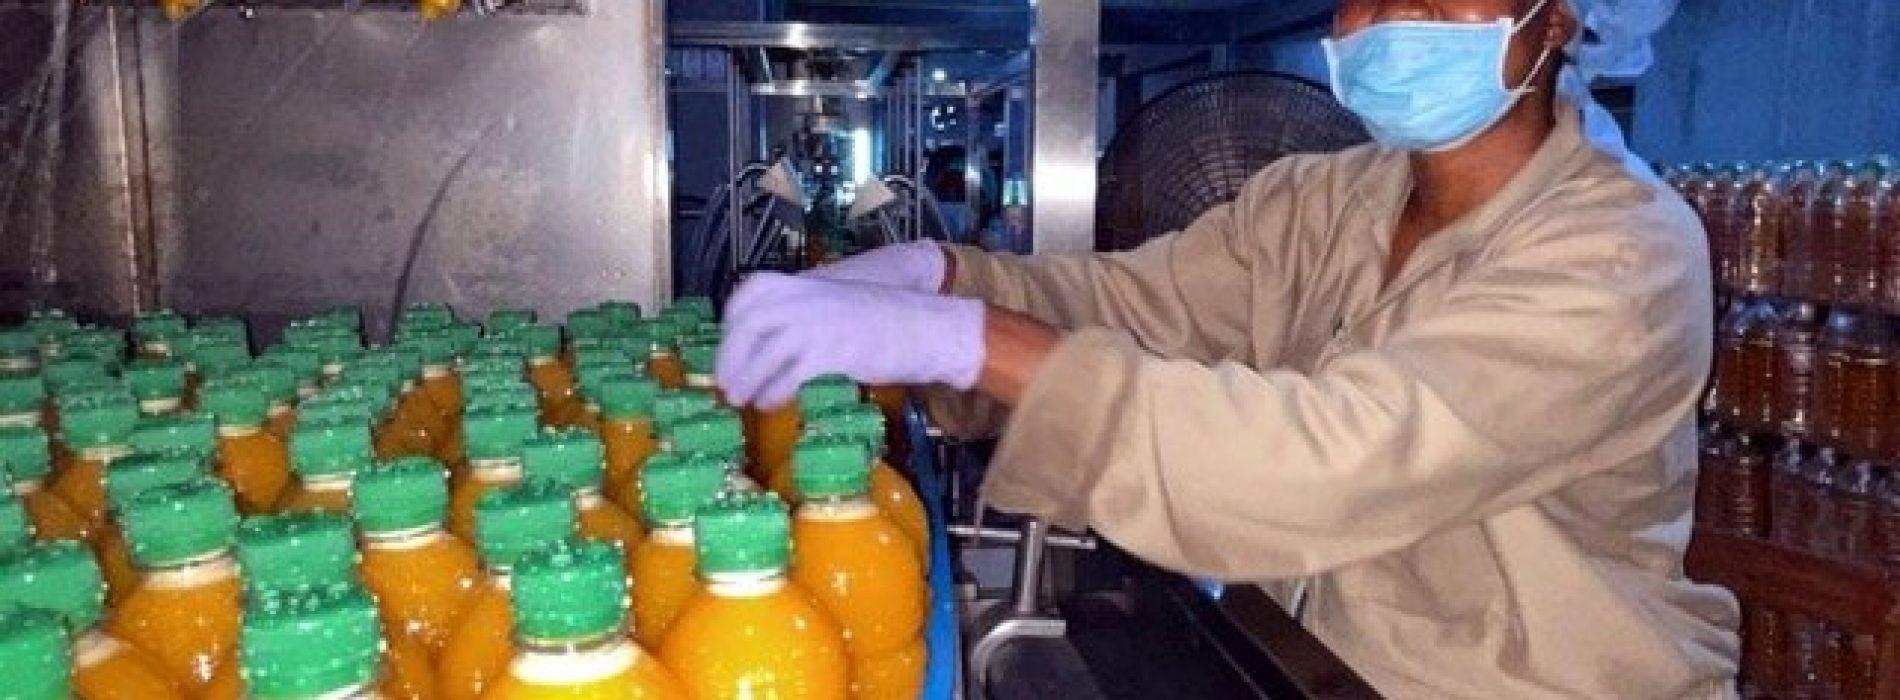 Creare un business di succhi di frutta in Sierra Leone: La storia di Sierra Juice